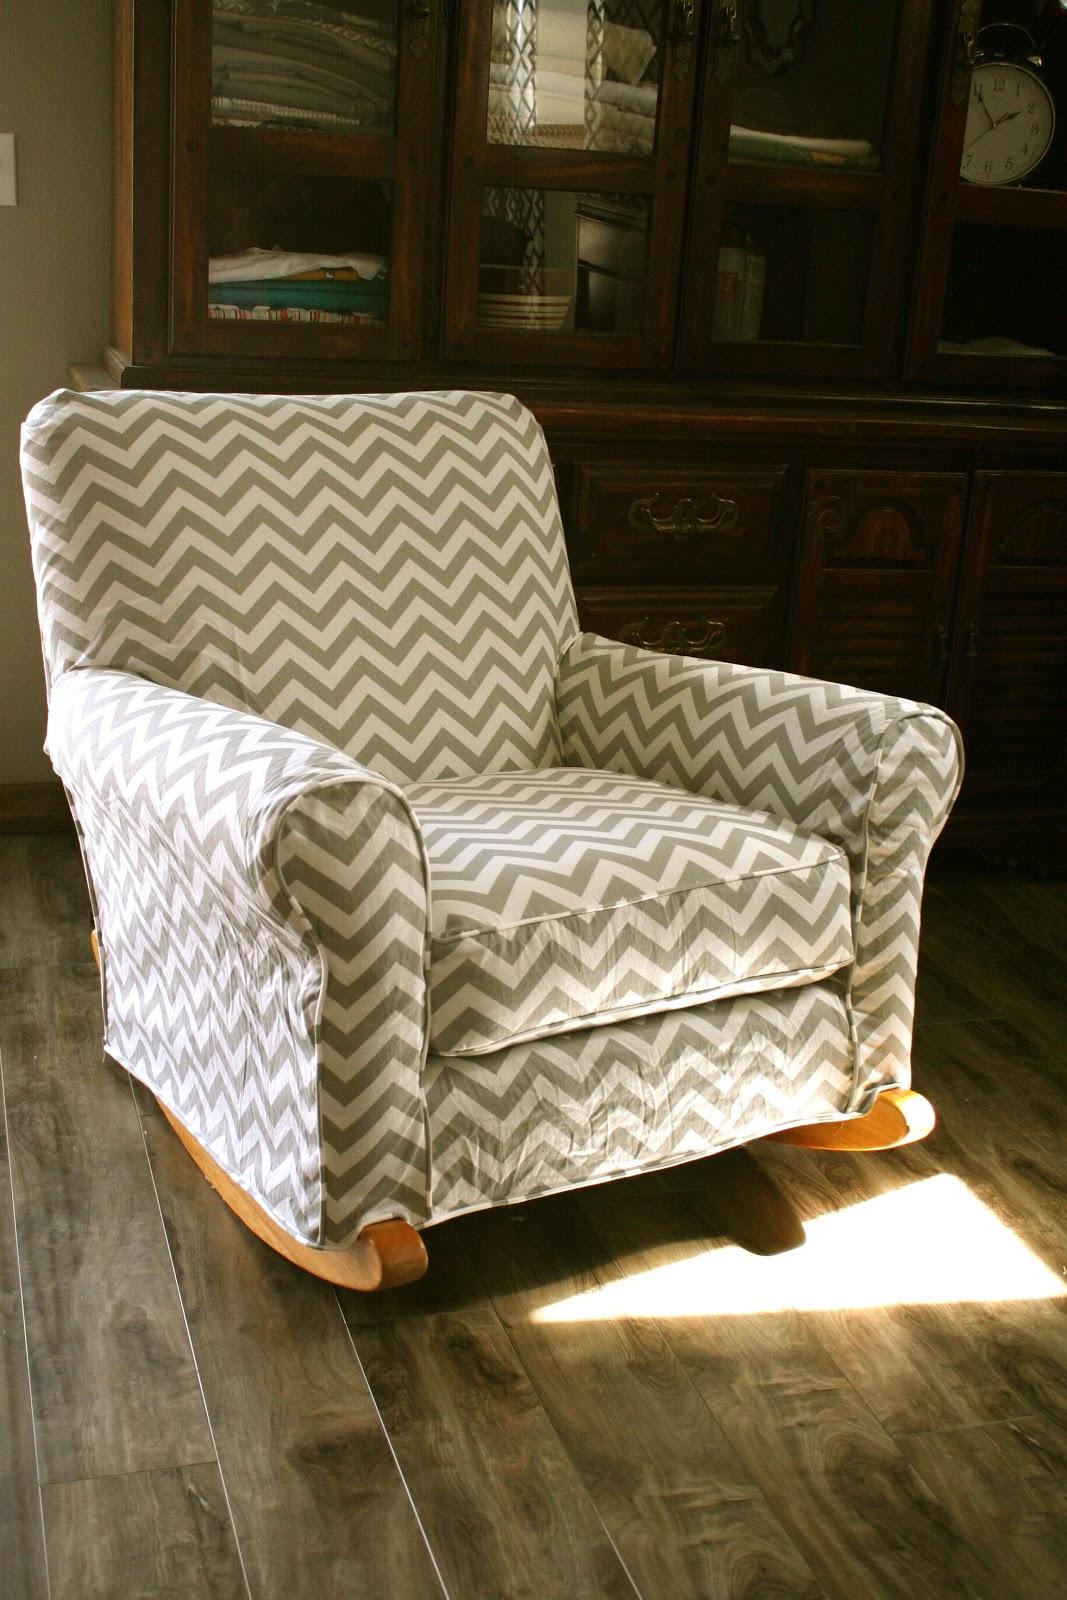 Chair Slipcover T Cushion Wooden Folding Covers Custom Slipcovers By Shelley: Chevron Nursery Rocker